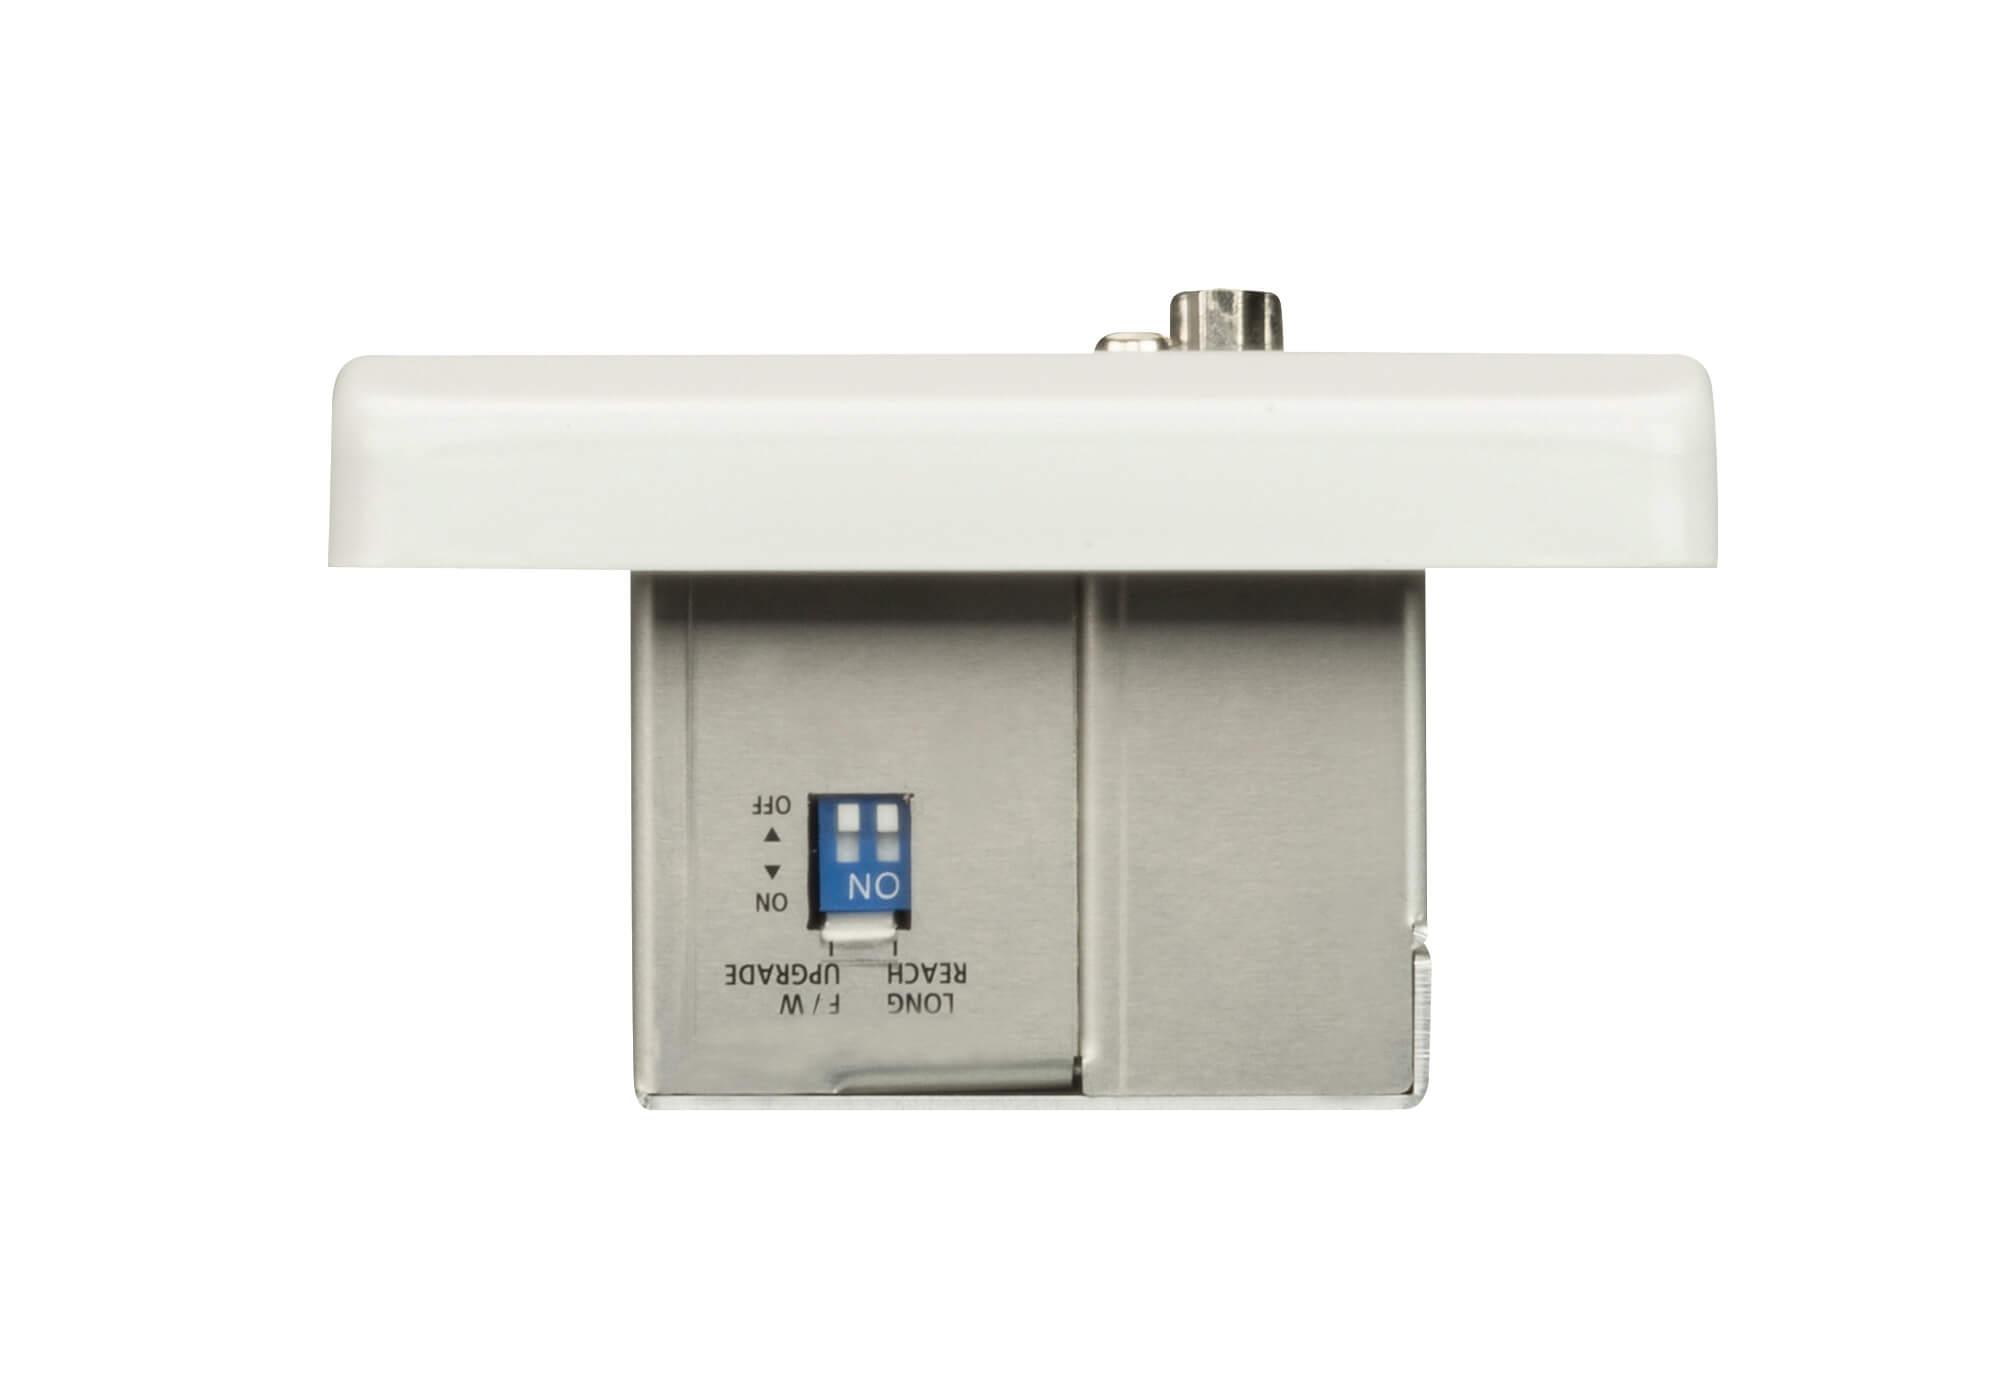 hdmi & vga hdbaset transmitter with eu wall plate-2